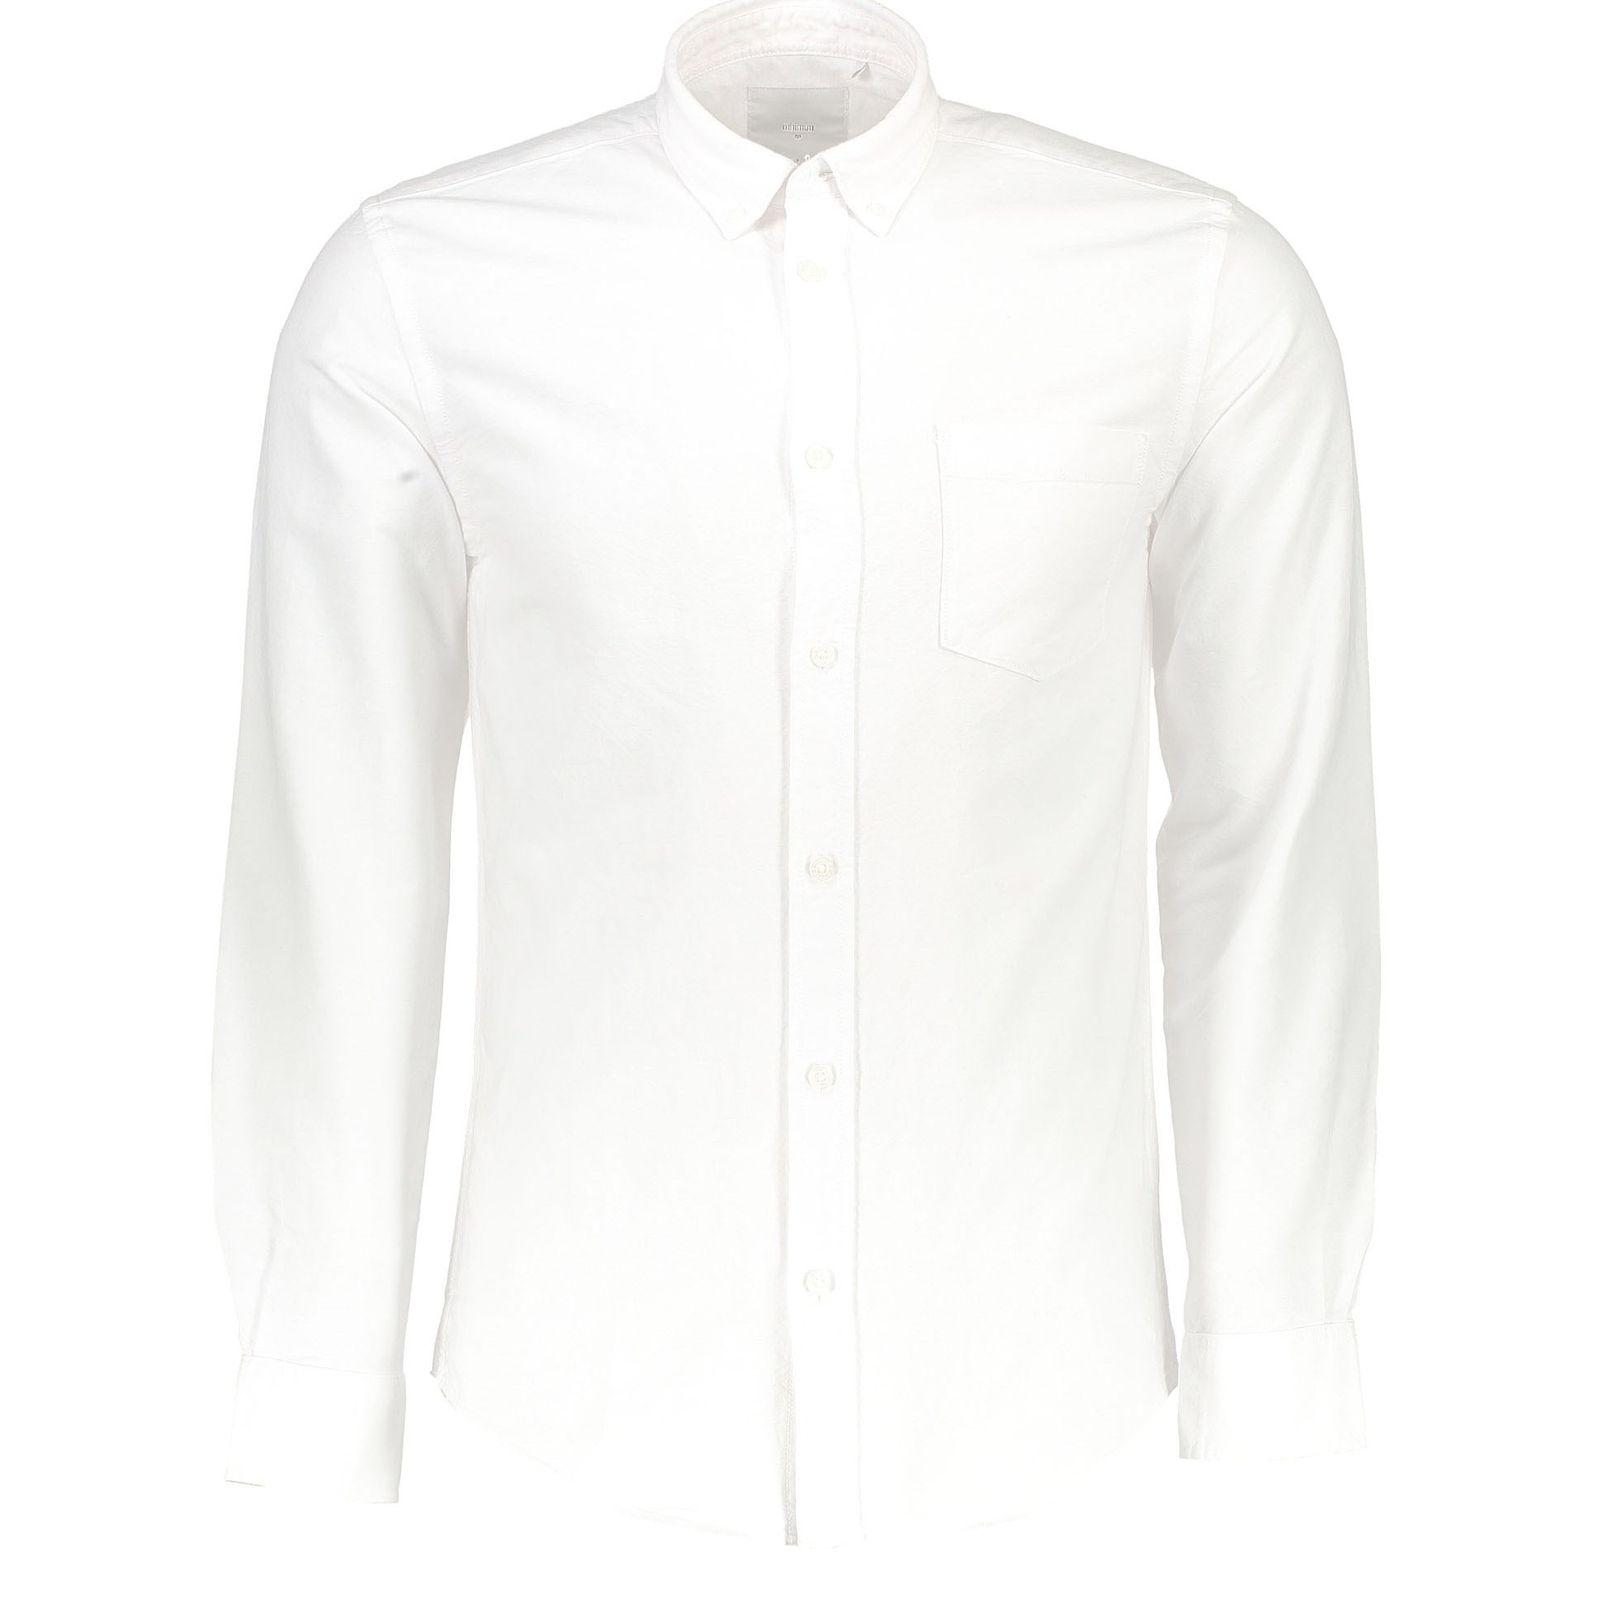 پیراهن نخی آستین بلند مردانه Jay 2.0 - مینیموم - سفيد - 1